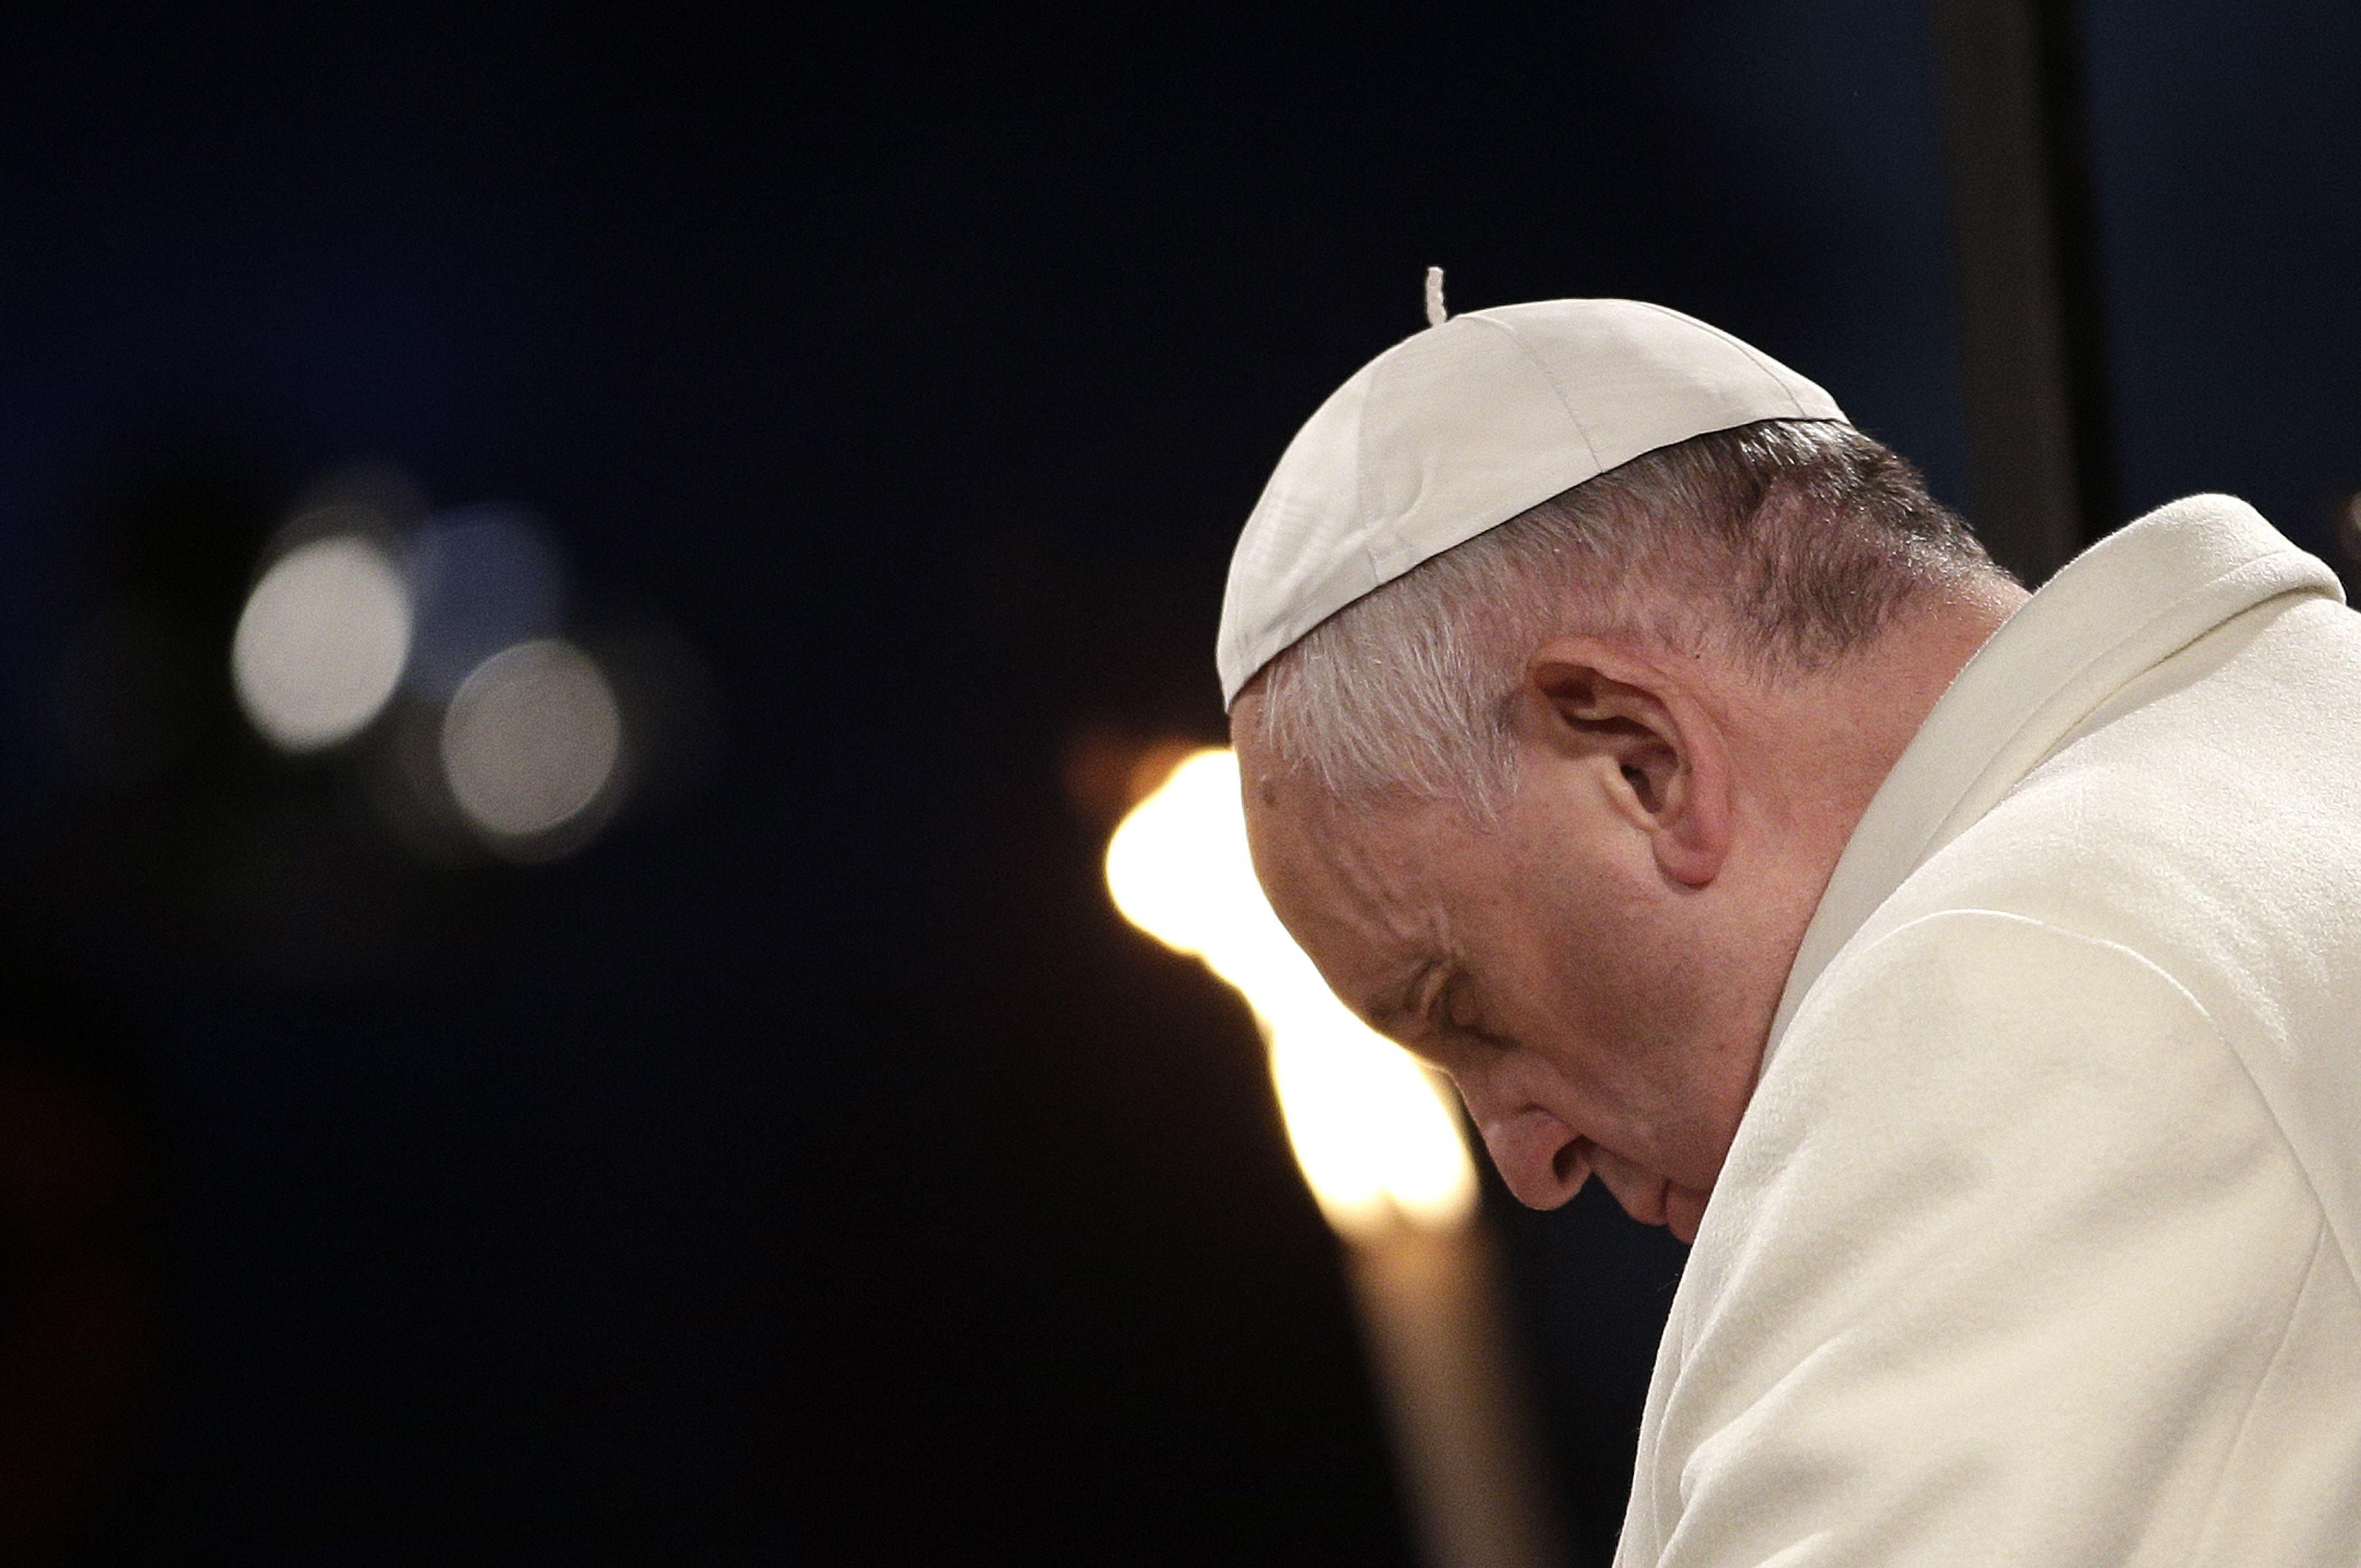 Igreja Católica recebe aviso de bombardeio israelense